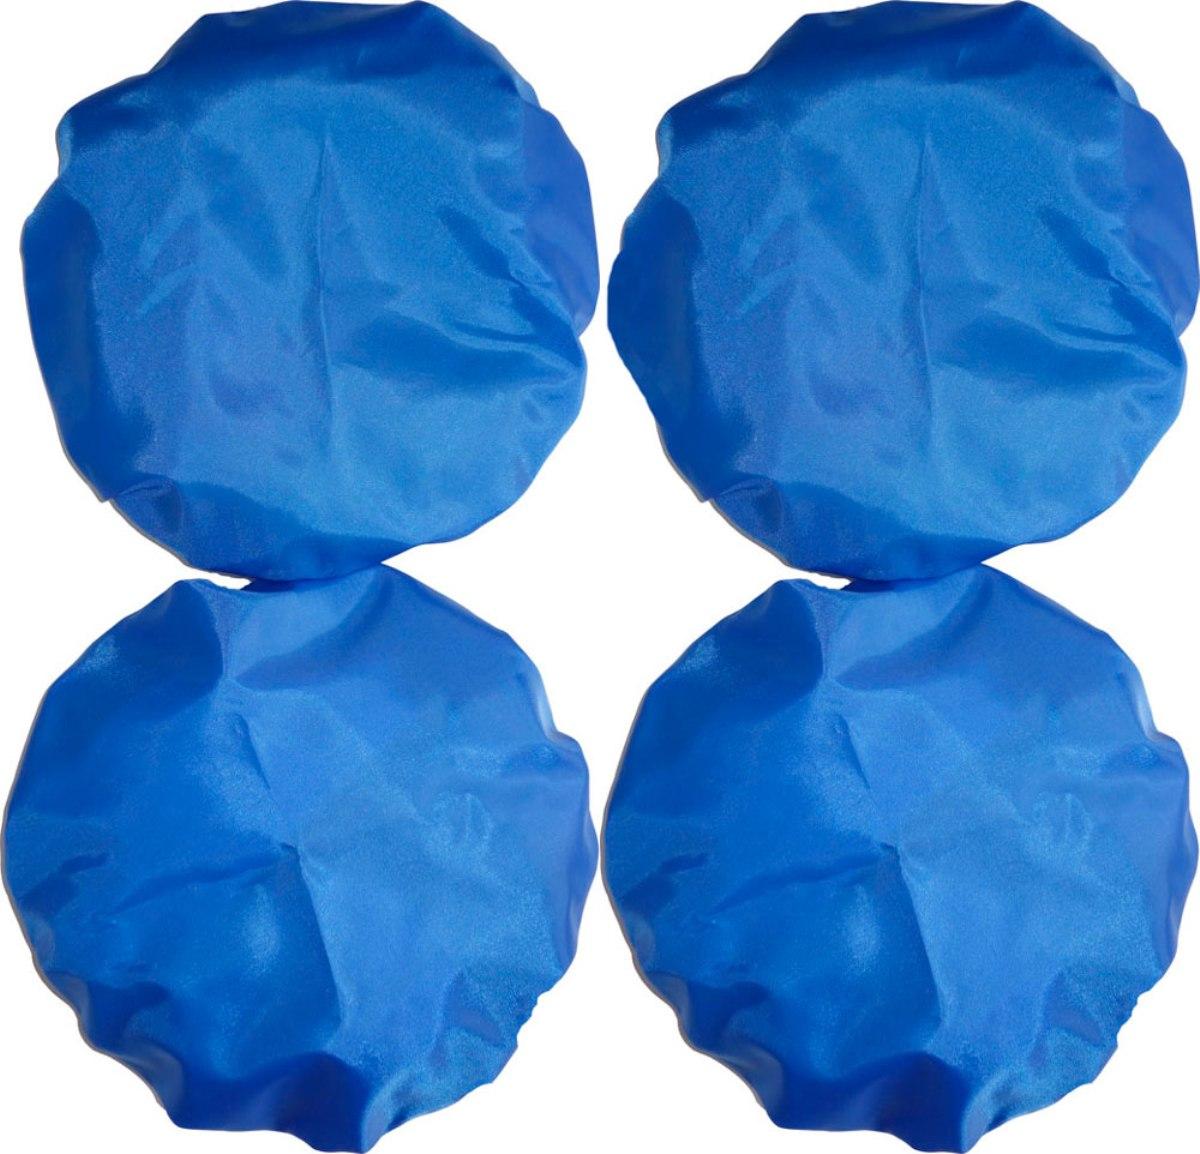 Чудо-Чадо Чехлы на колеса для коляски диаметр 28-38 см цвет синий 4 шт